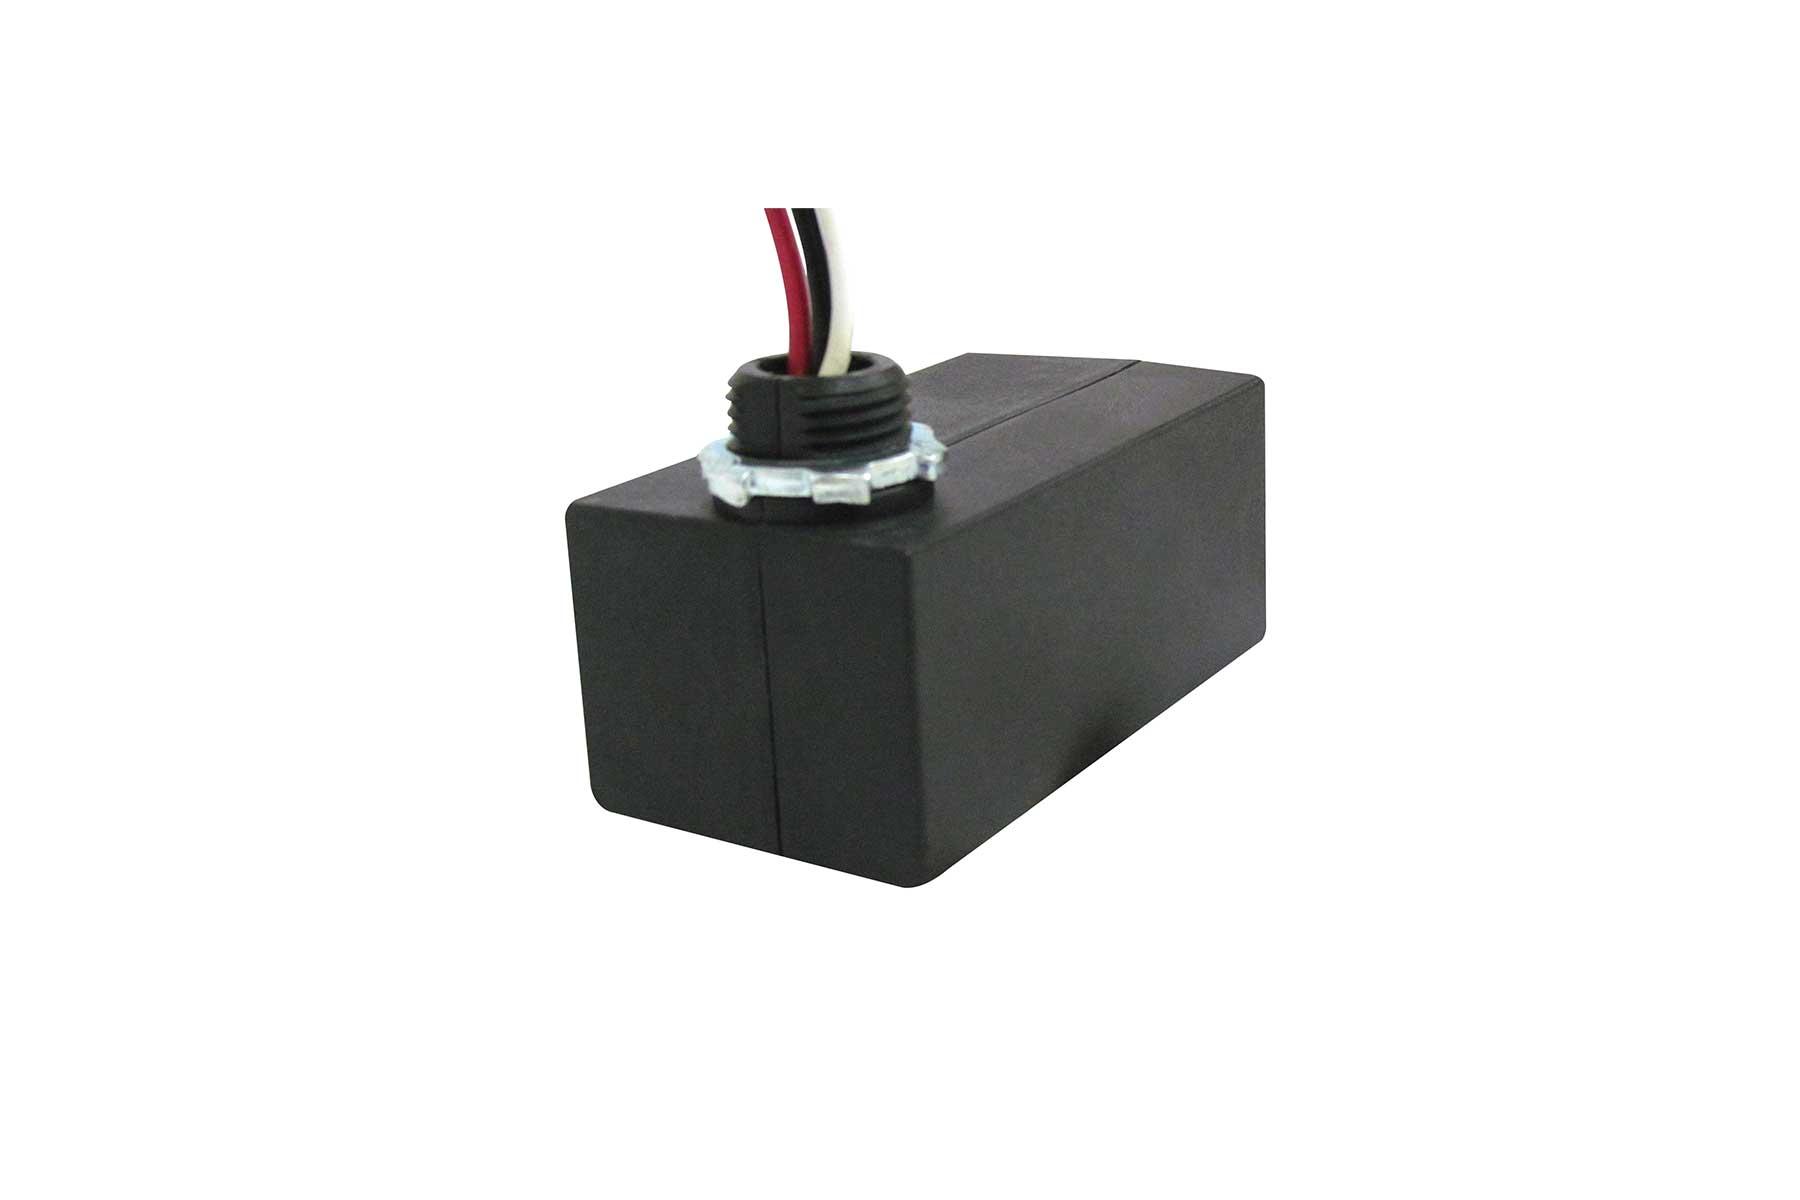 Line Voltage 347V to 120V Step Down Transformer